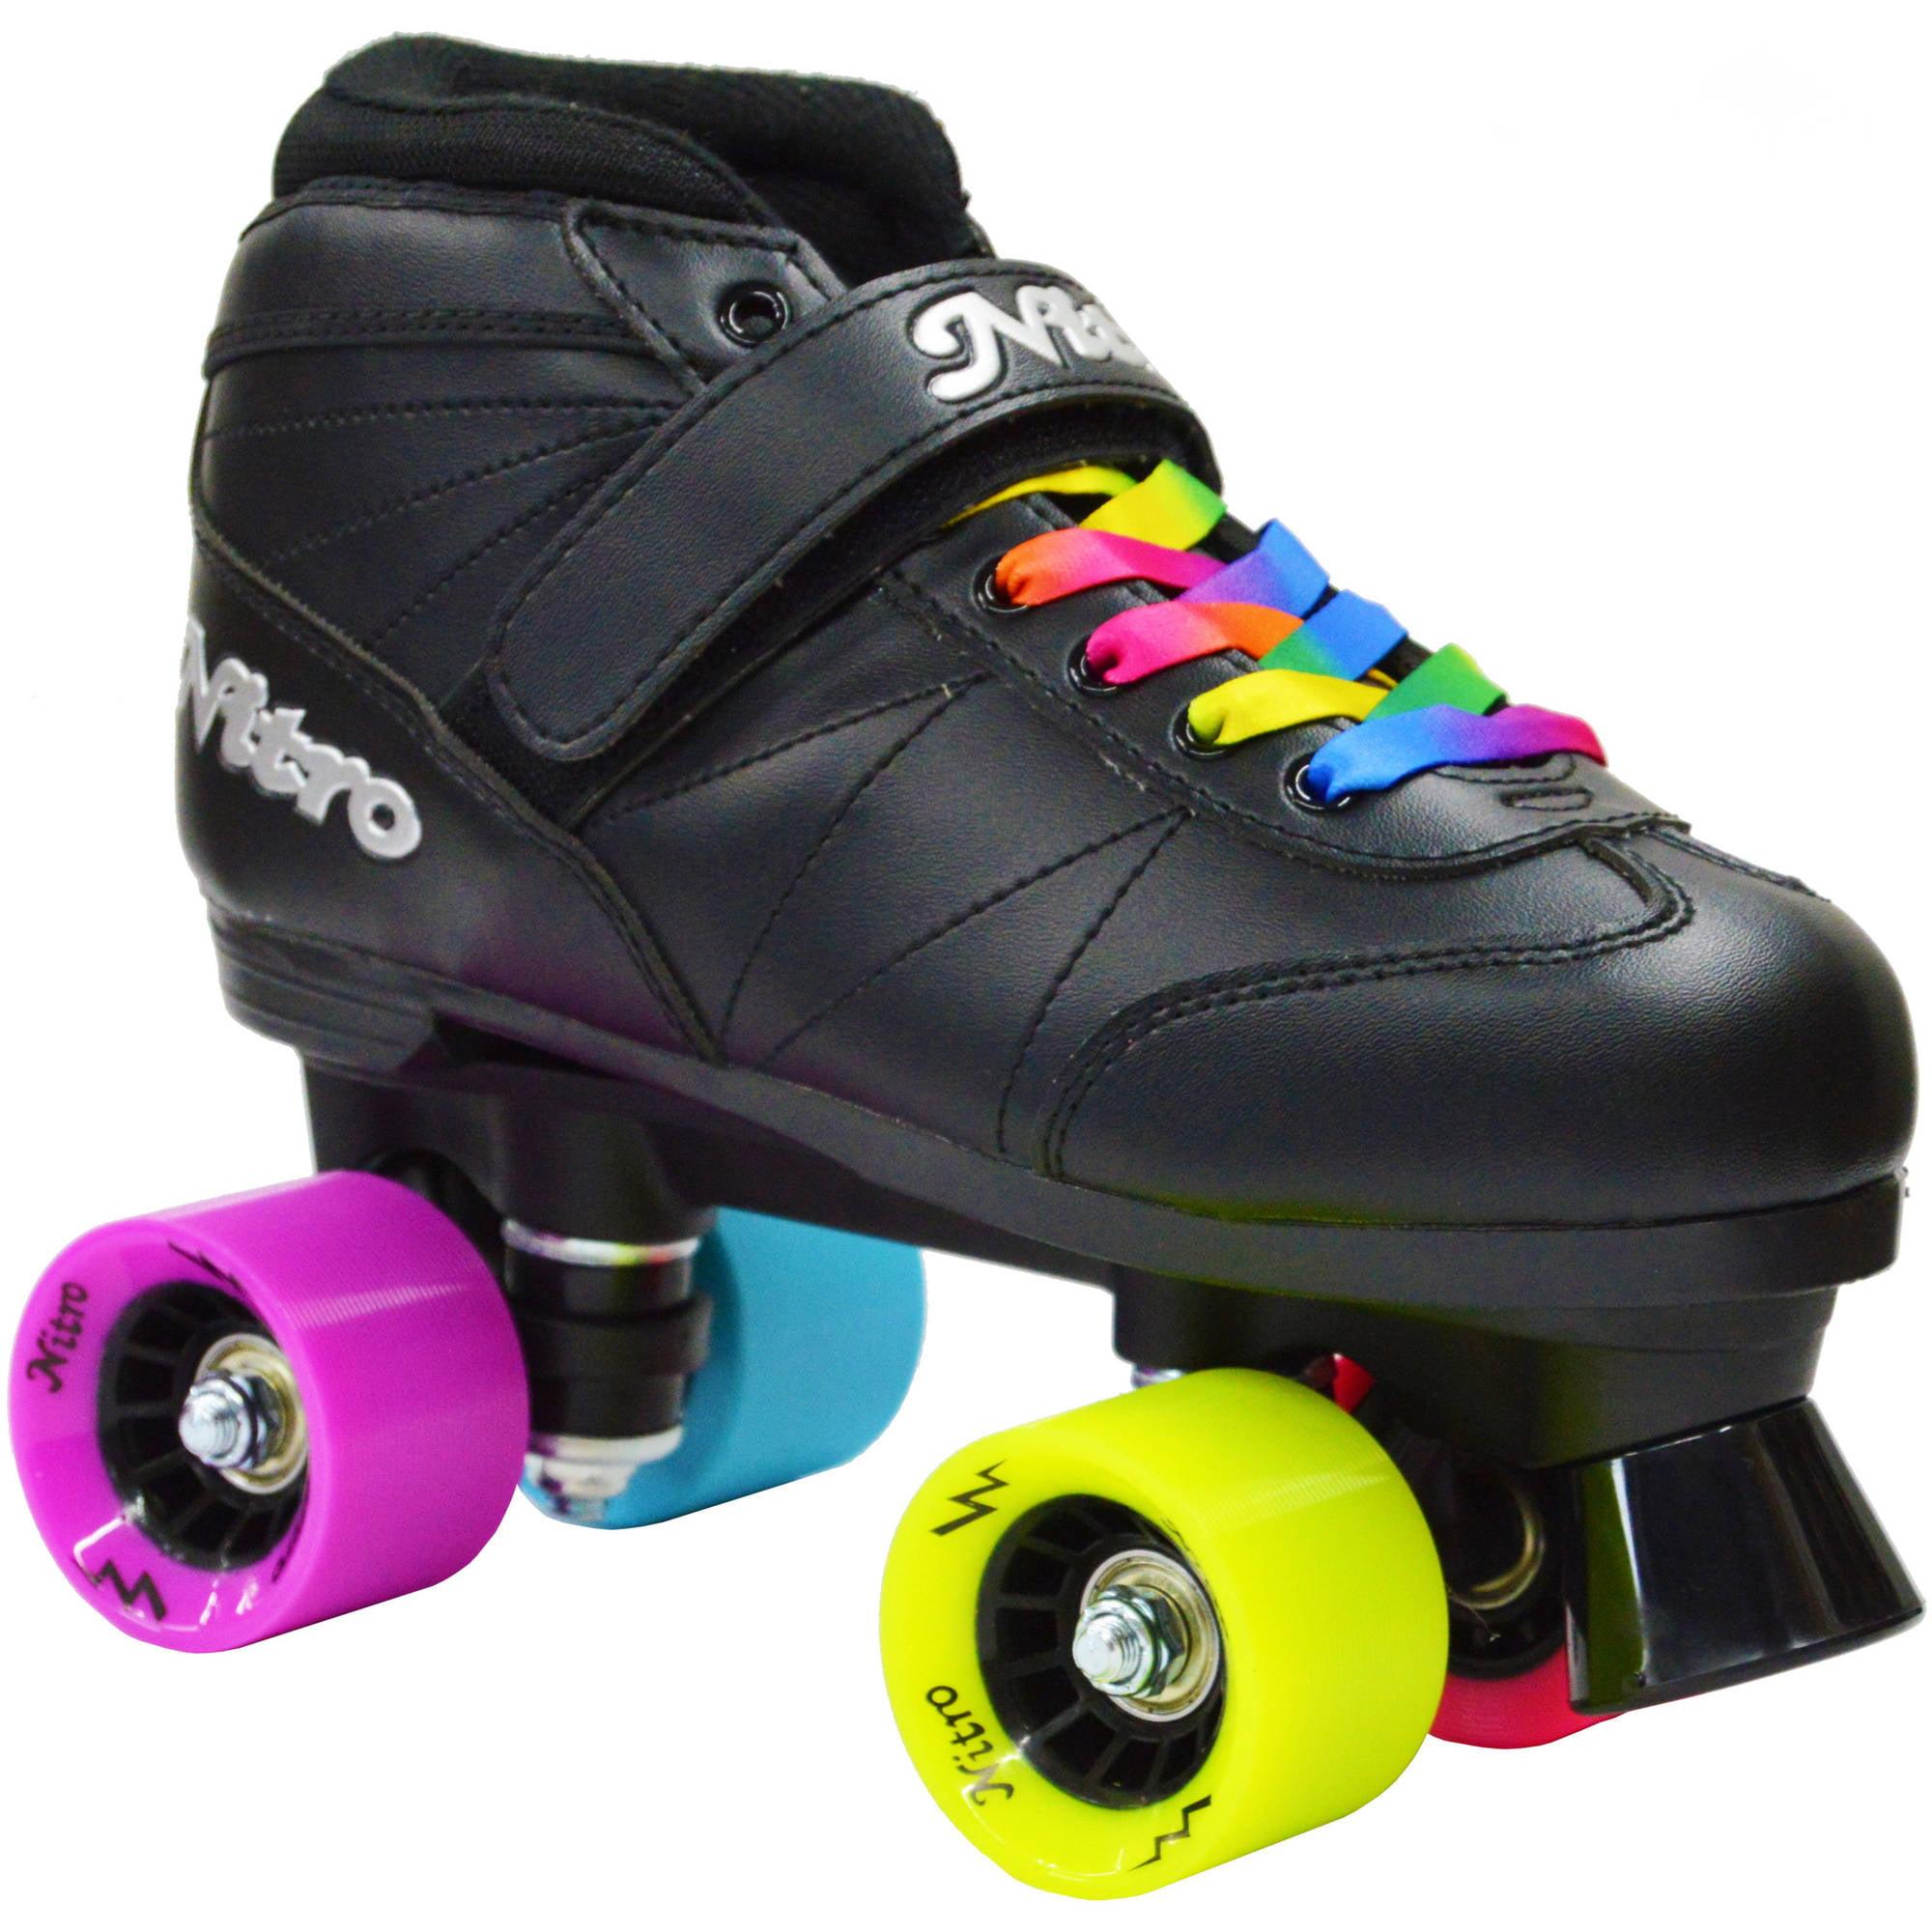 Roller skates rainbow - Roller Skates Rainbow 10